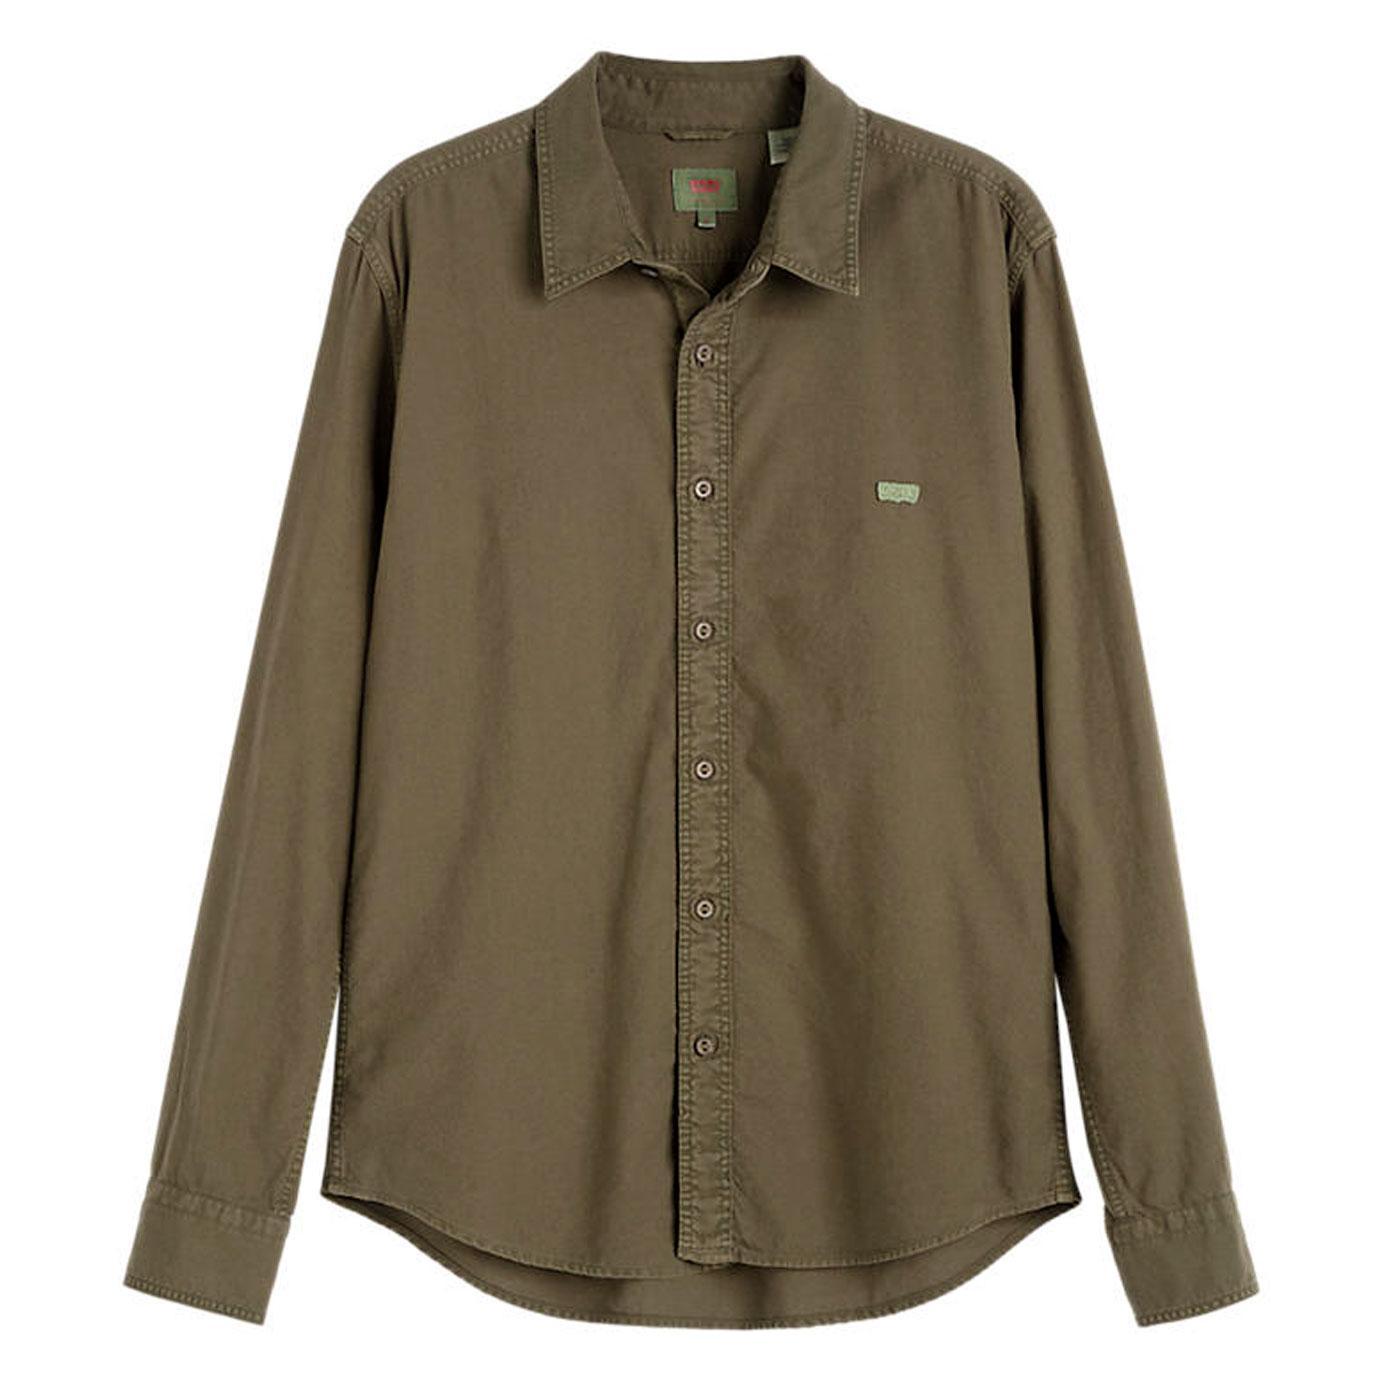 LEVI'S Battery L/S HM Slim Oxford Shirt - Olive